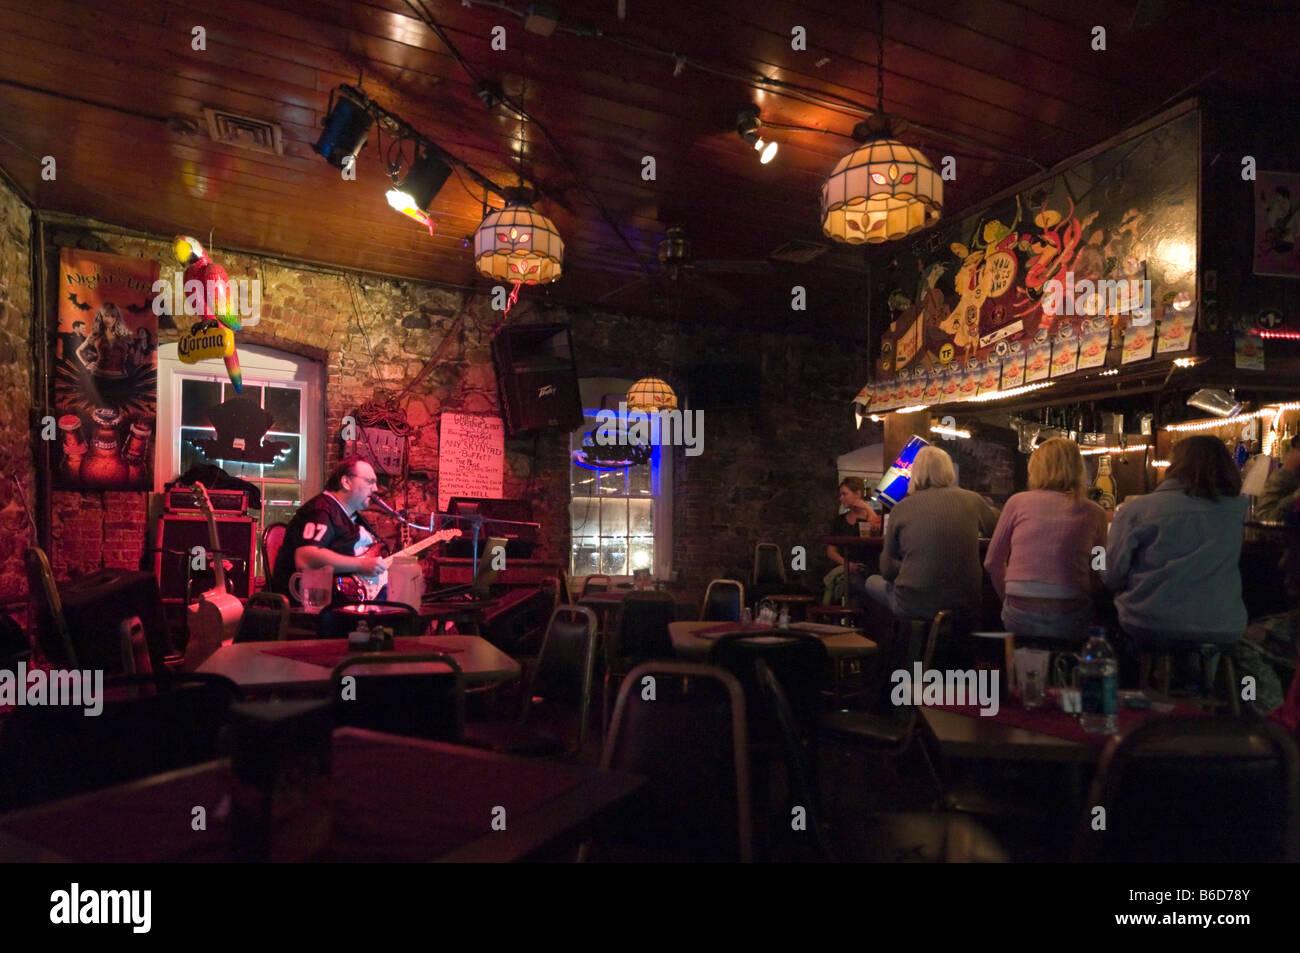 Live music at the Bayou Cafe, Abercorn Street just off River Street, Historic District, Savannah, Georgia, USA - Stock Image